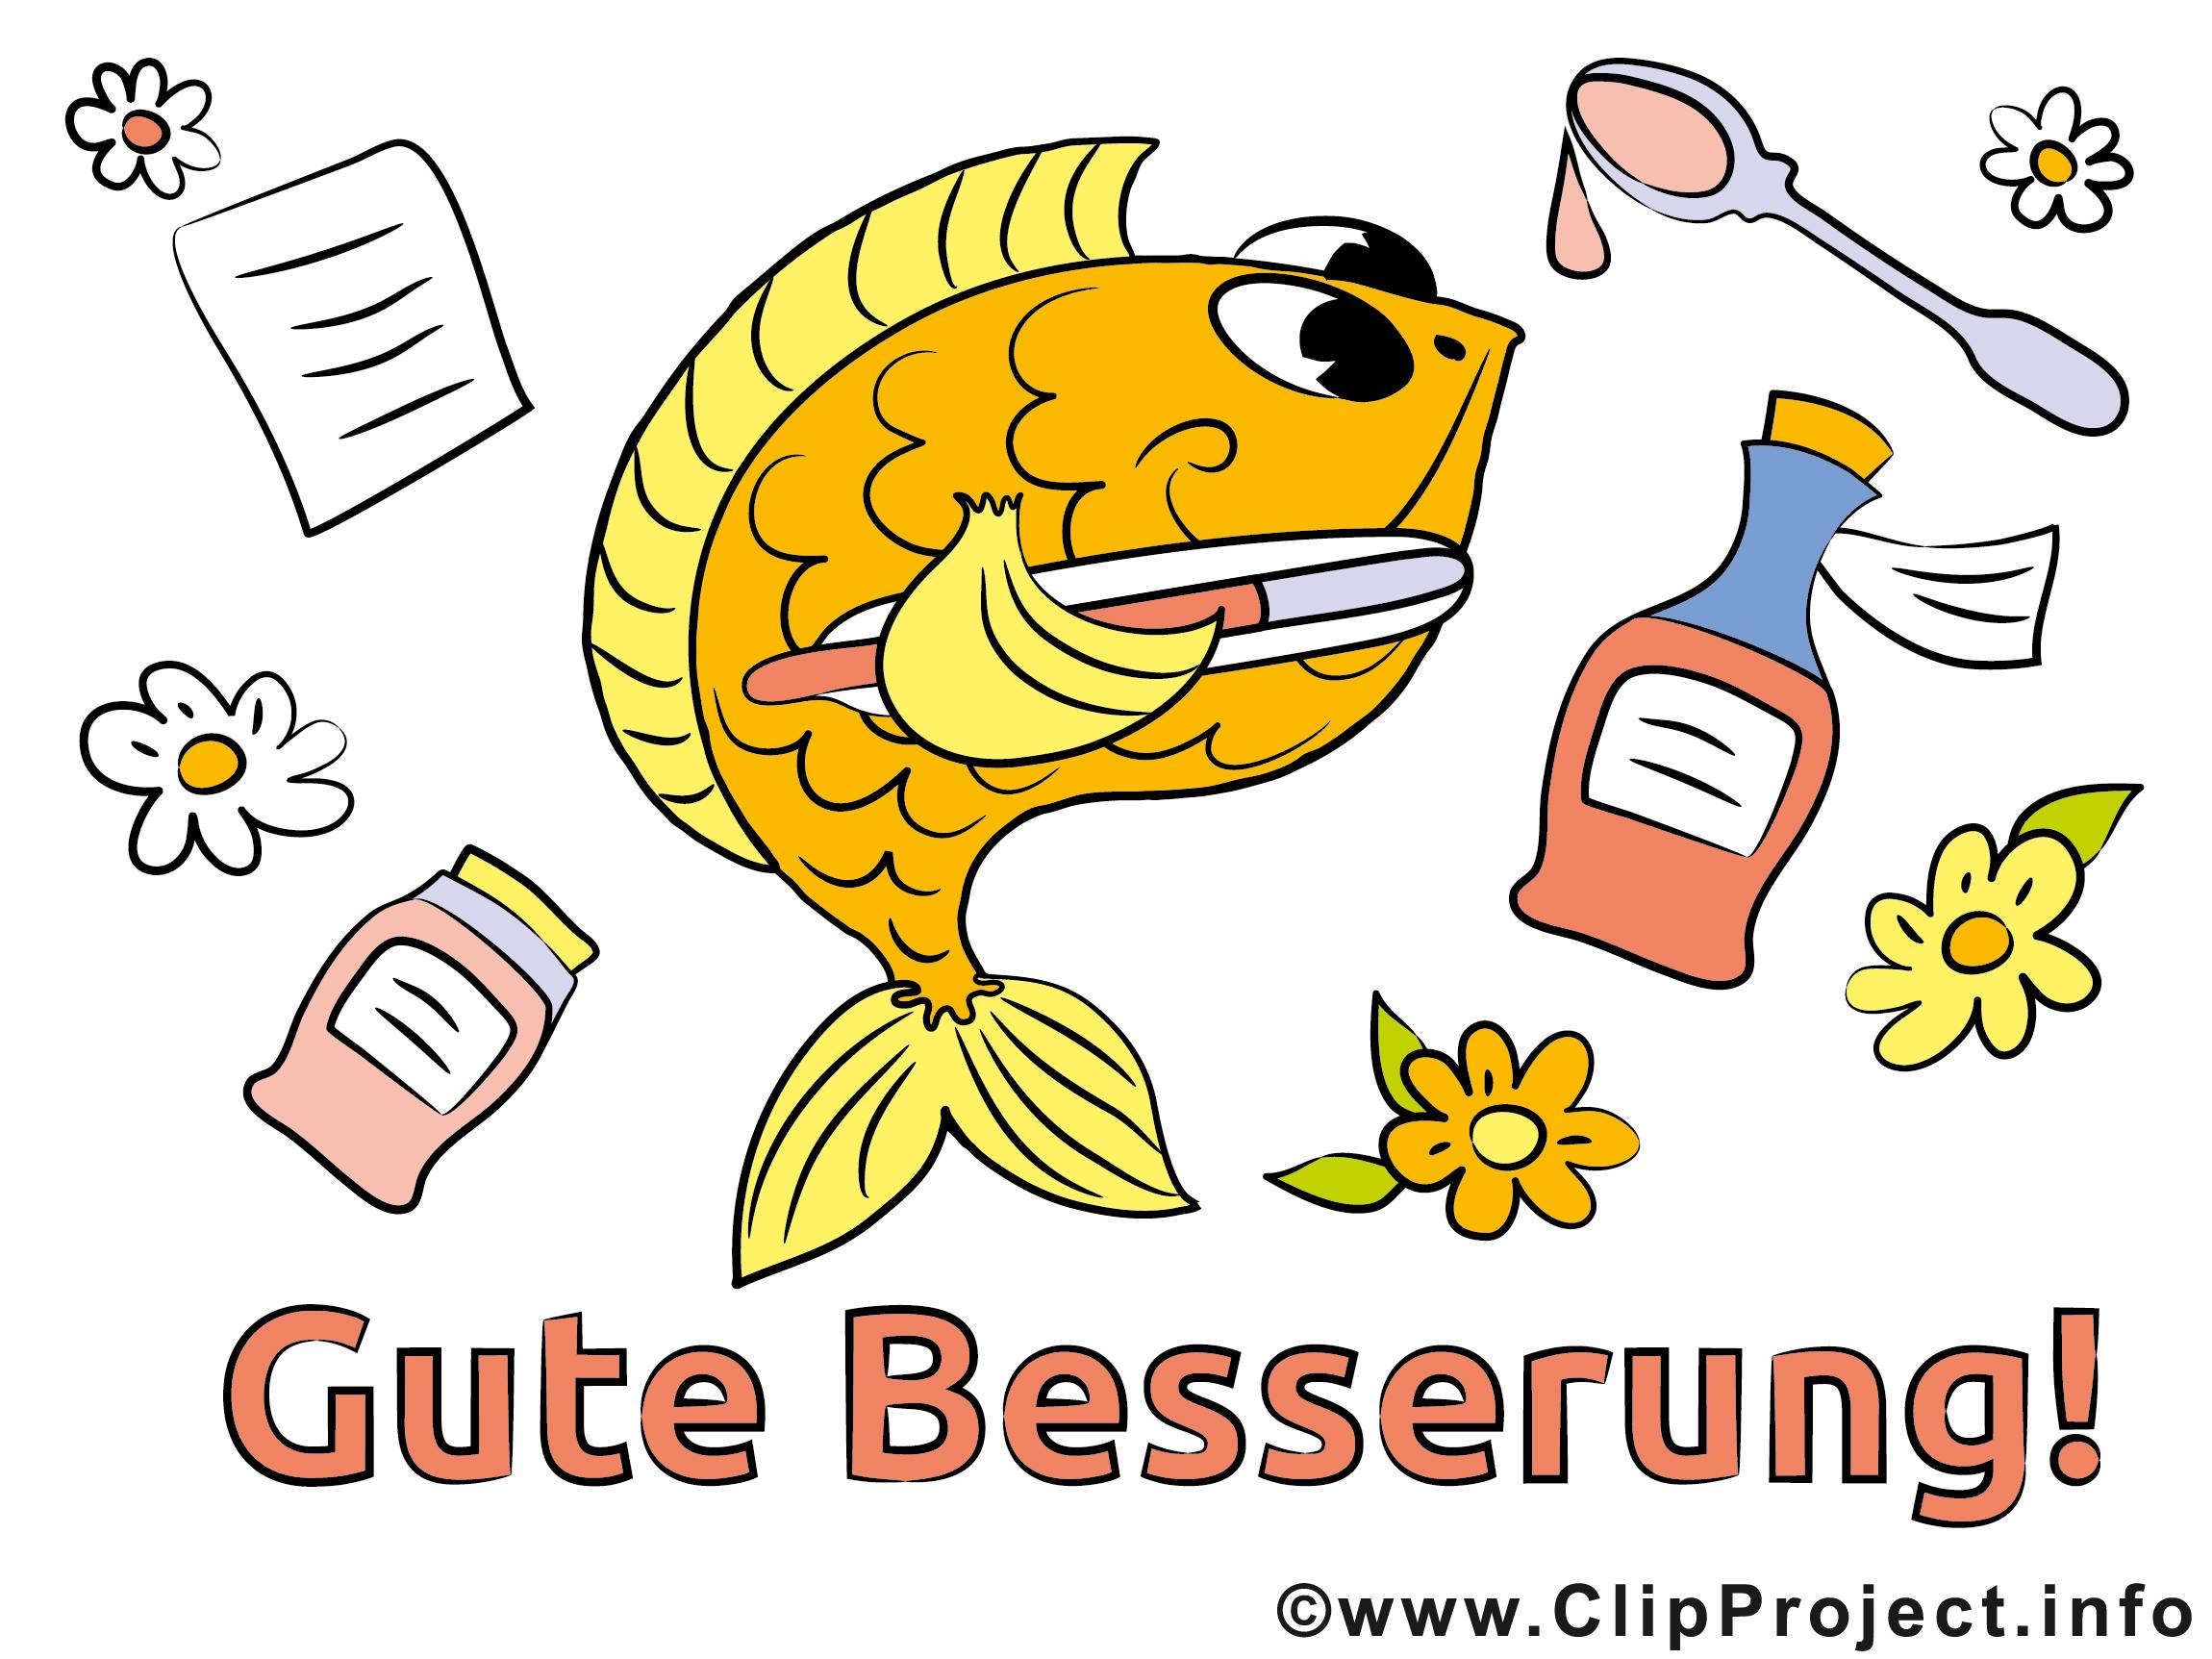 Cliparts gute besserung jpg freeuse stock Gute Besserung Sprüche Lustig | Jtleigh.com - Hausgestaltung Ideen jpg freeuse stock